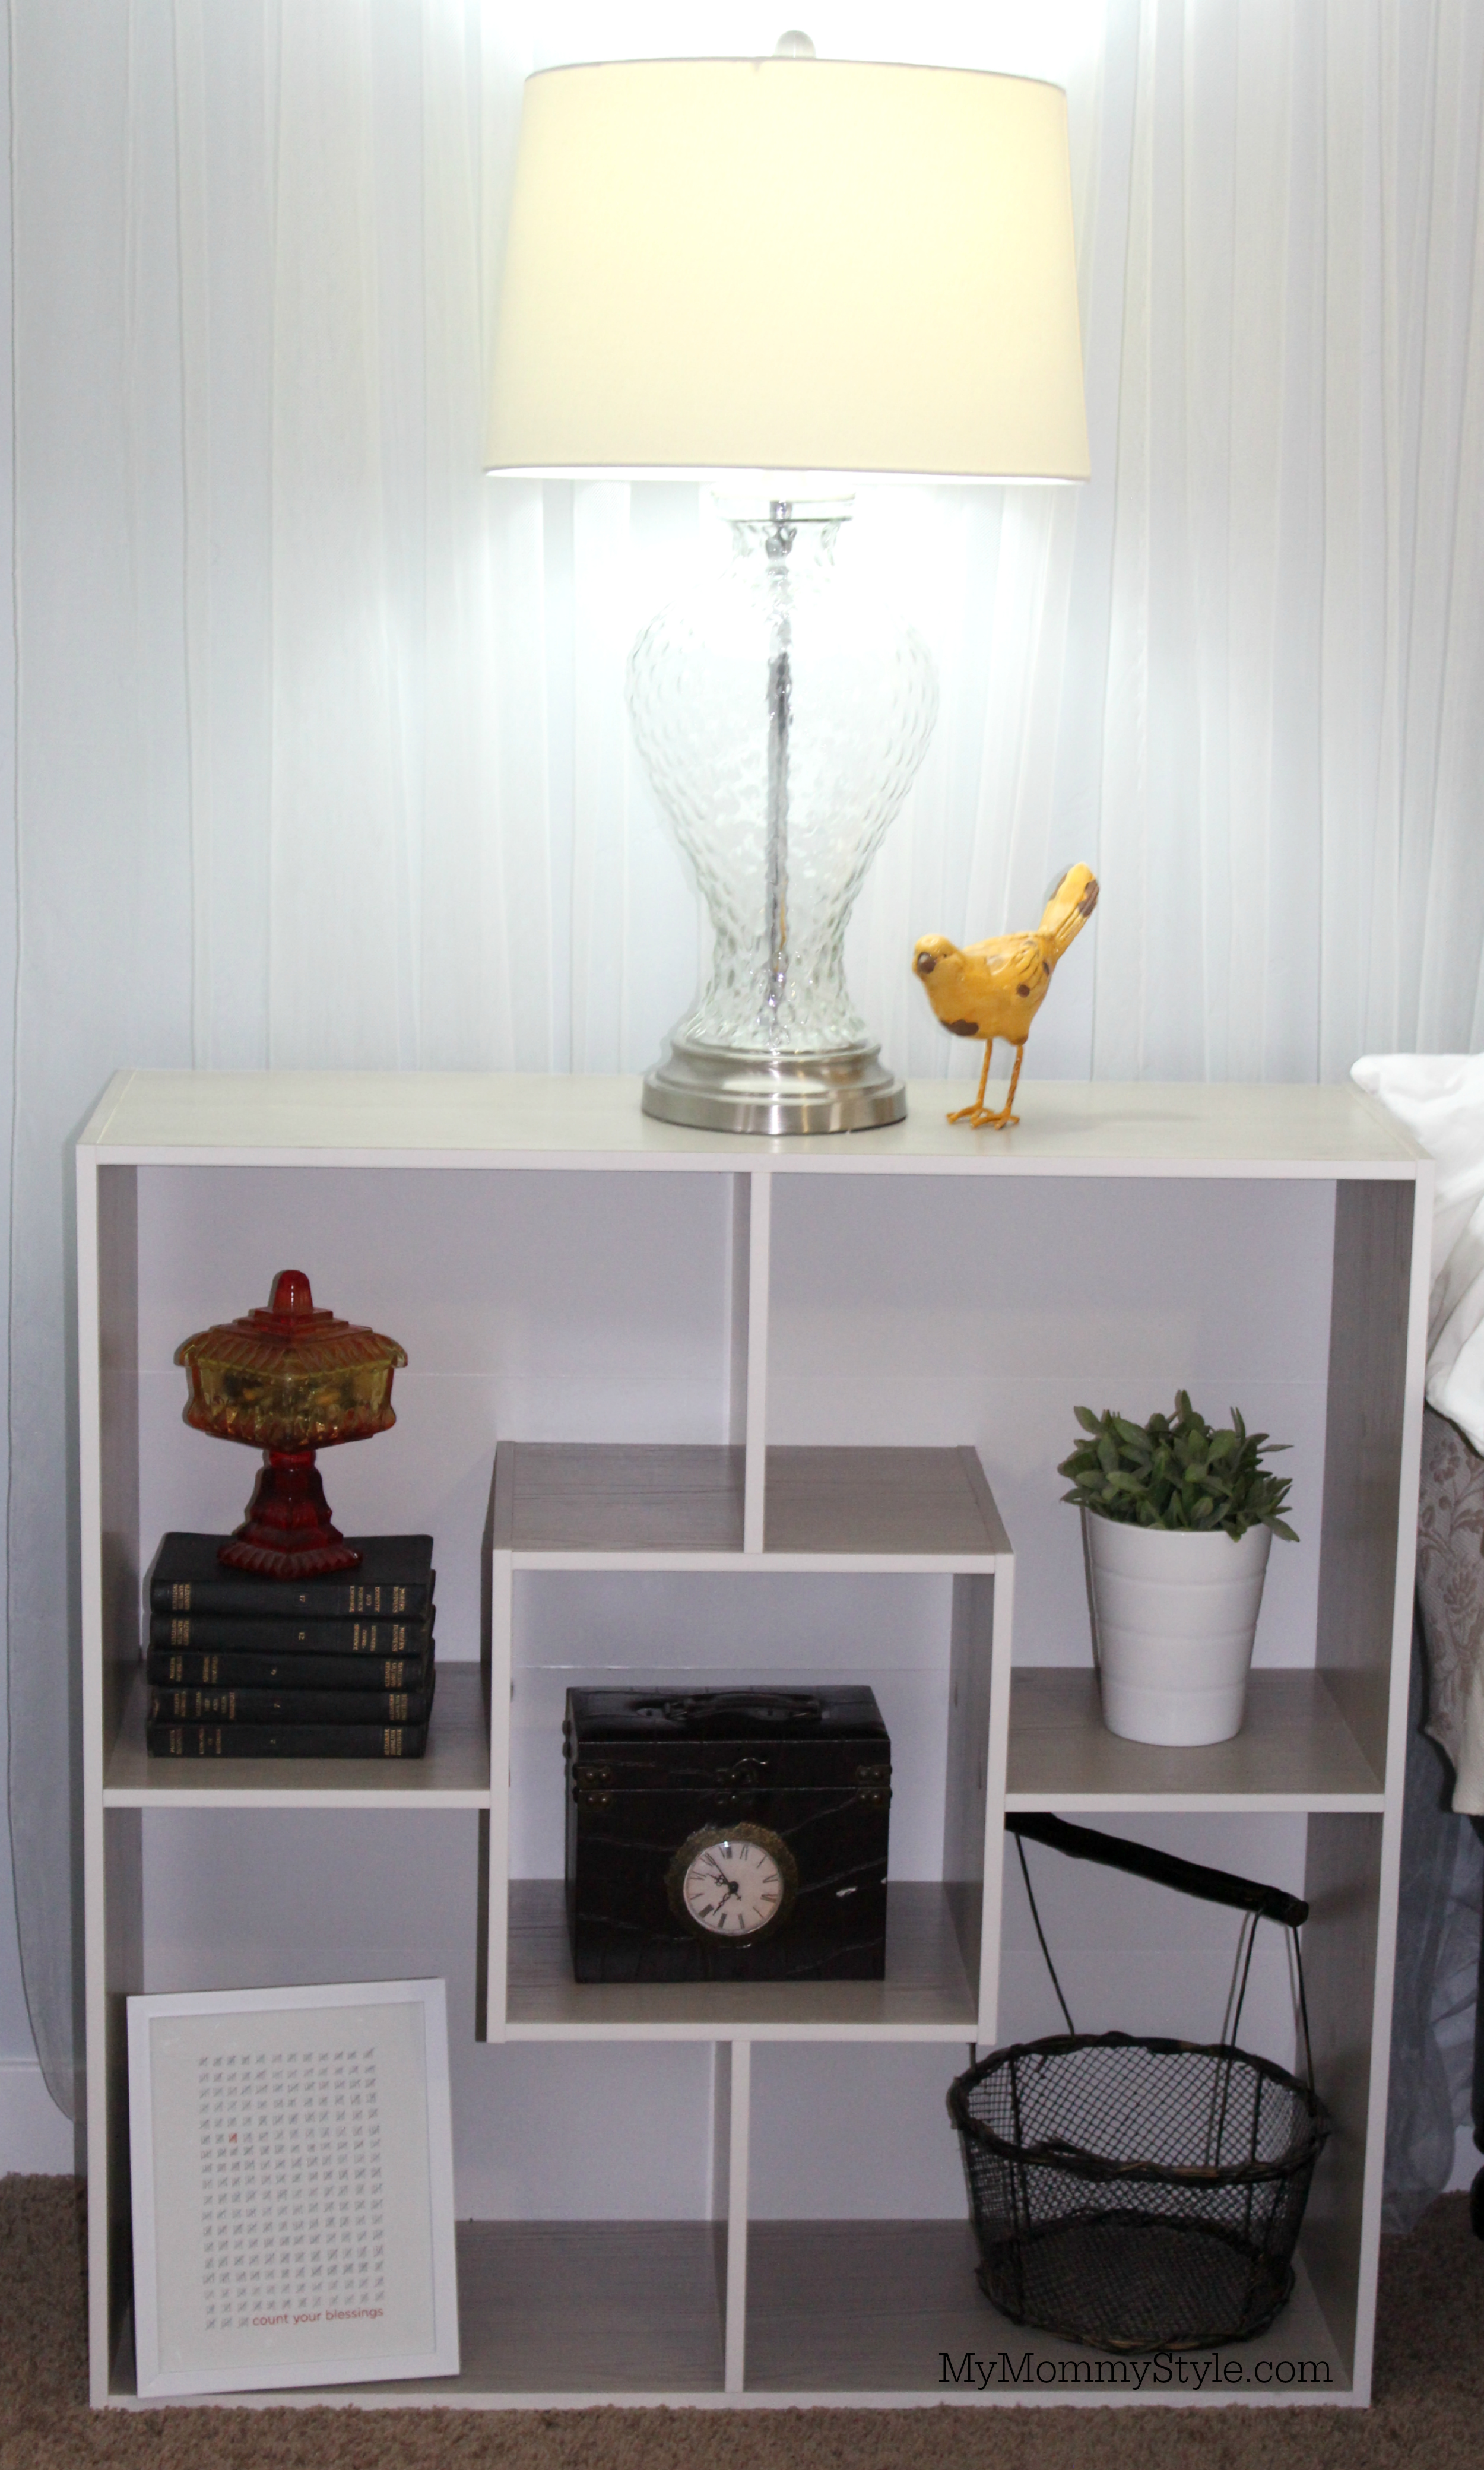 Bookshelf nightstand with simple decor